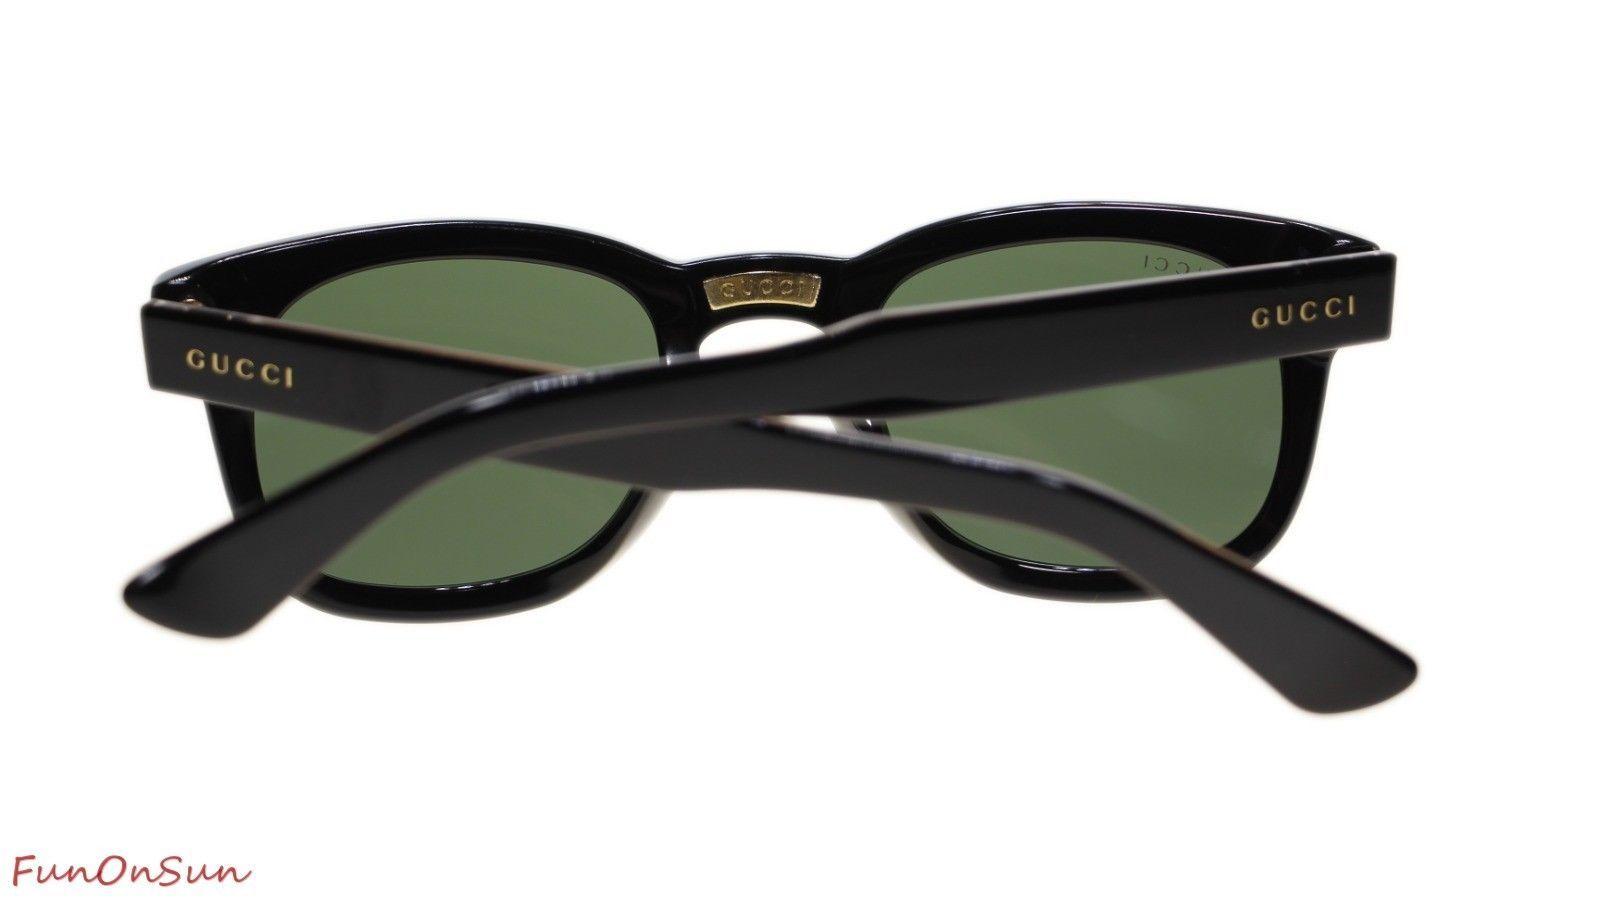 815768db73 Gucci Unisex Sunglasses GG0182S 002 Black Green Lens 49mm Authentic